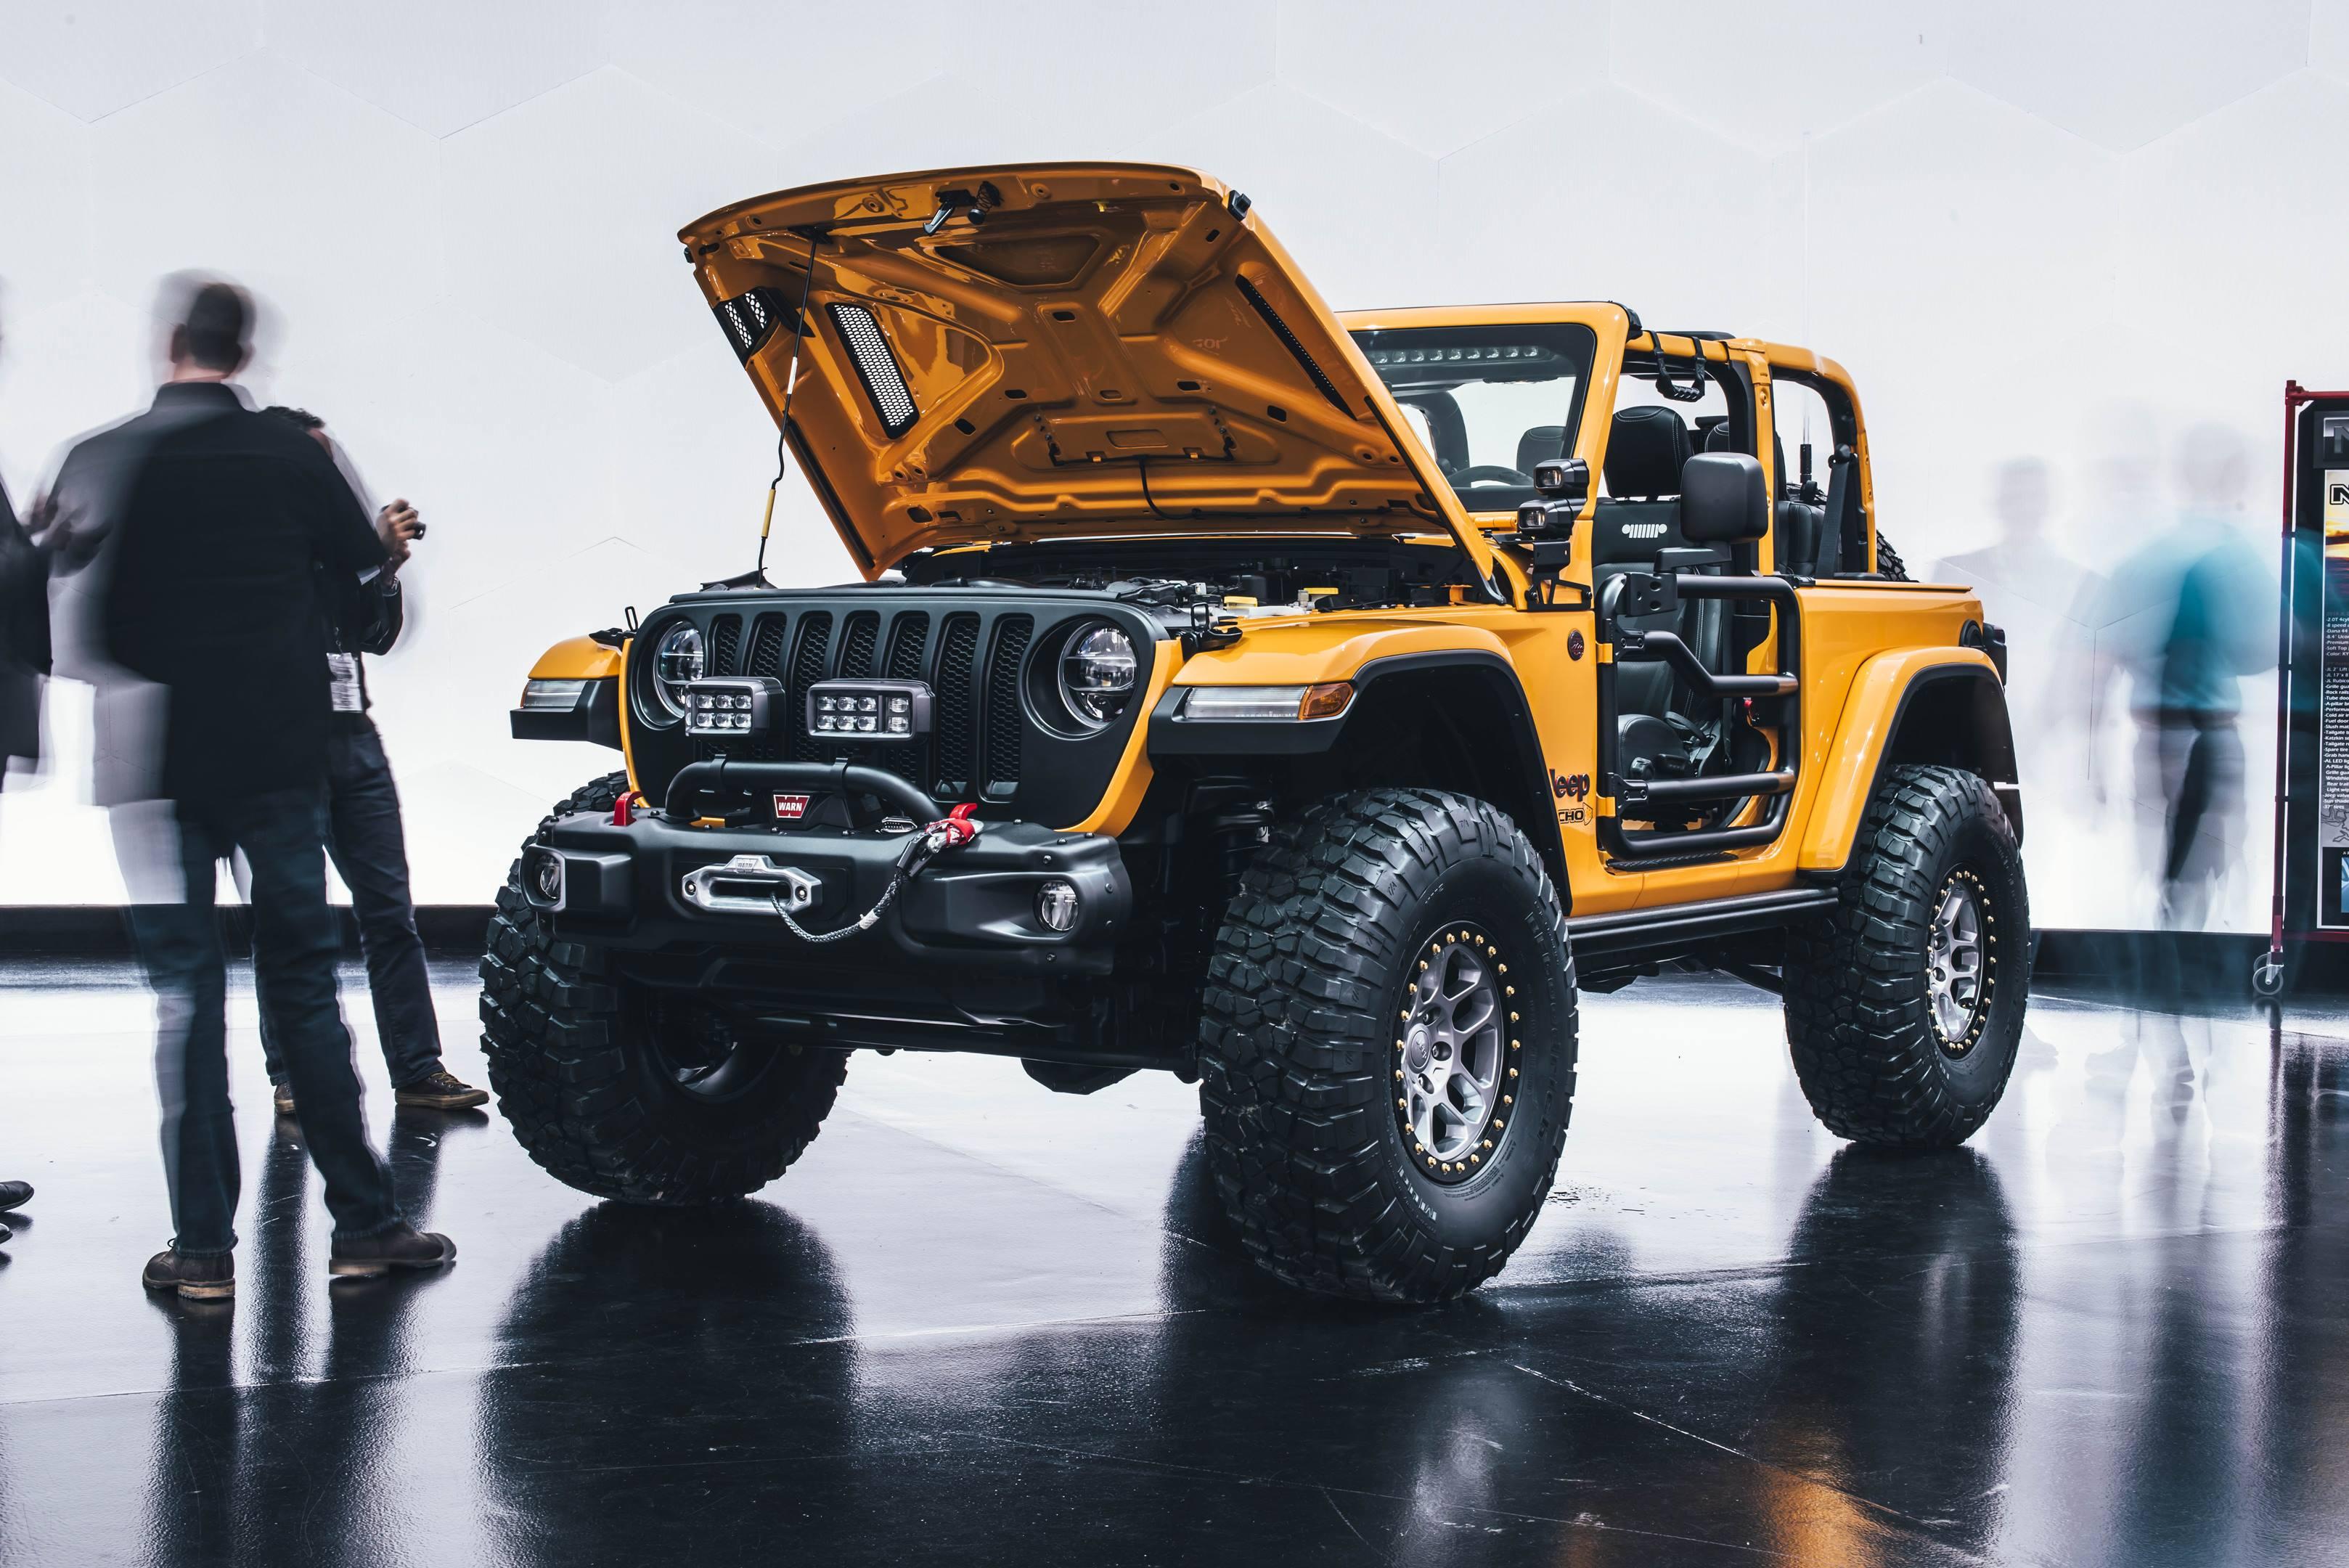 2018 Jeep Nacho Concept front 3/4